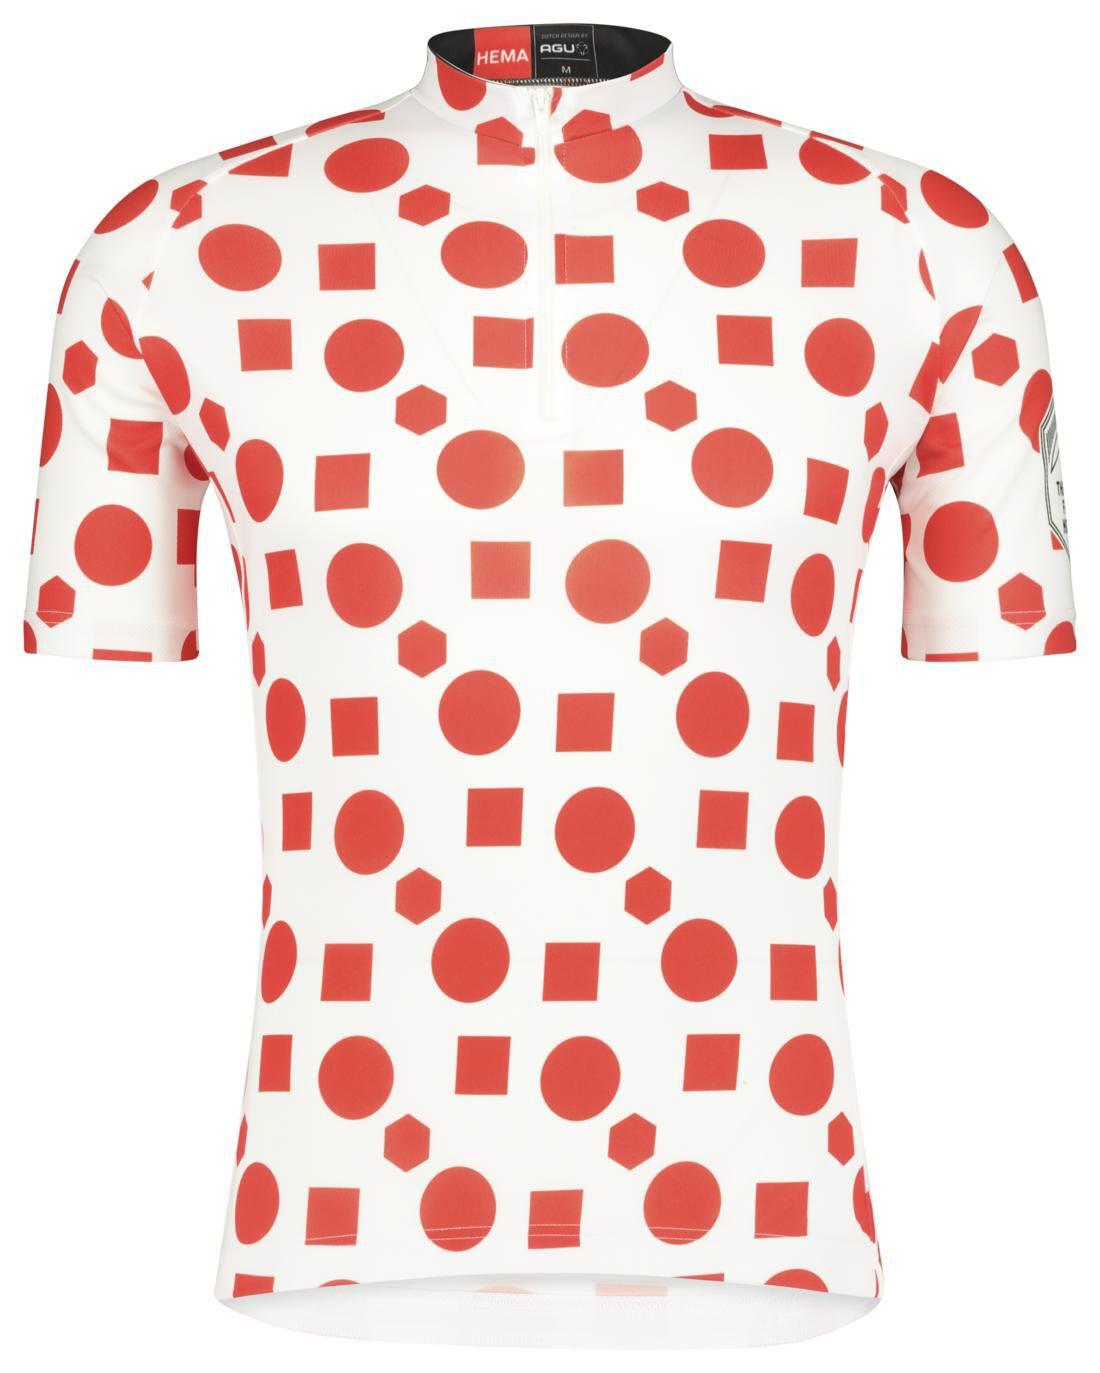 HEMA Fietsshirt Berg Rood (rood)